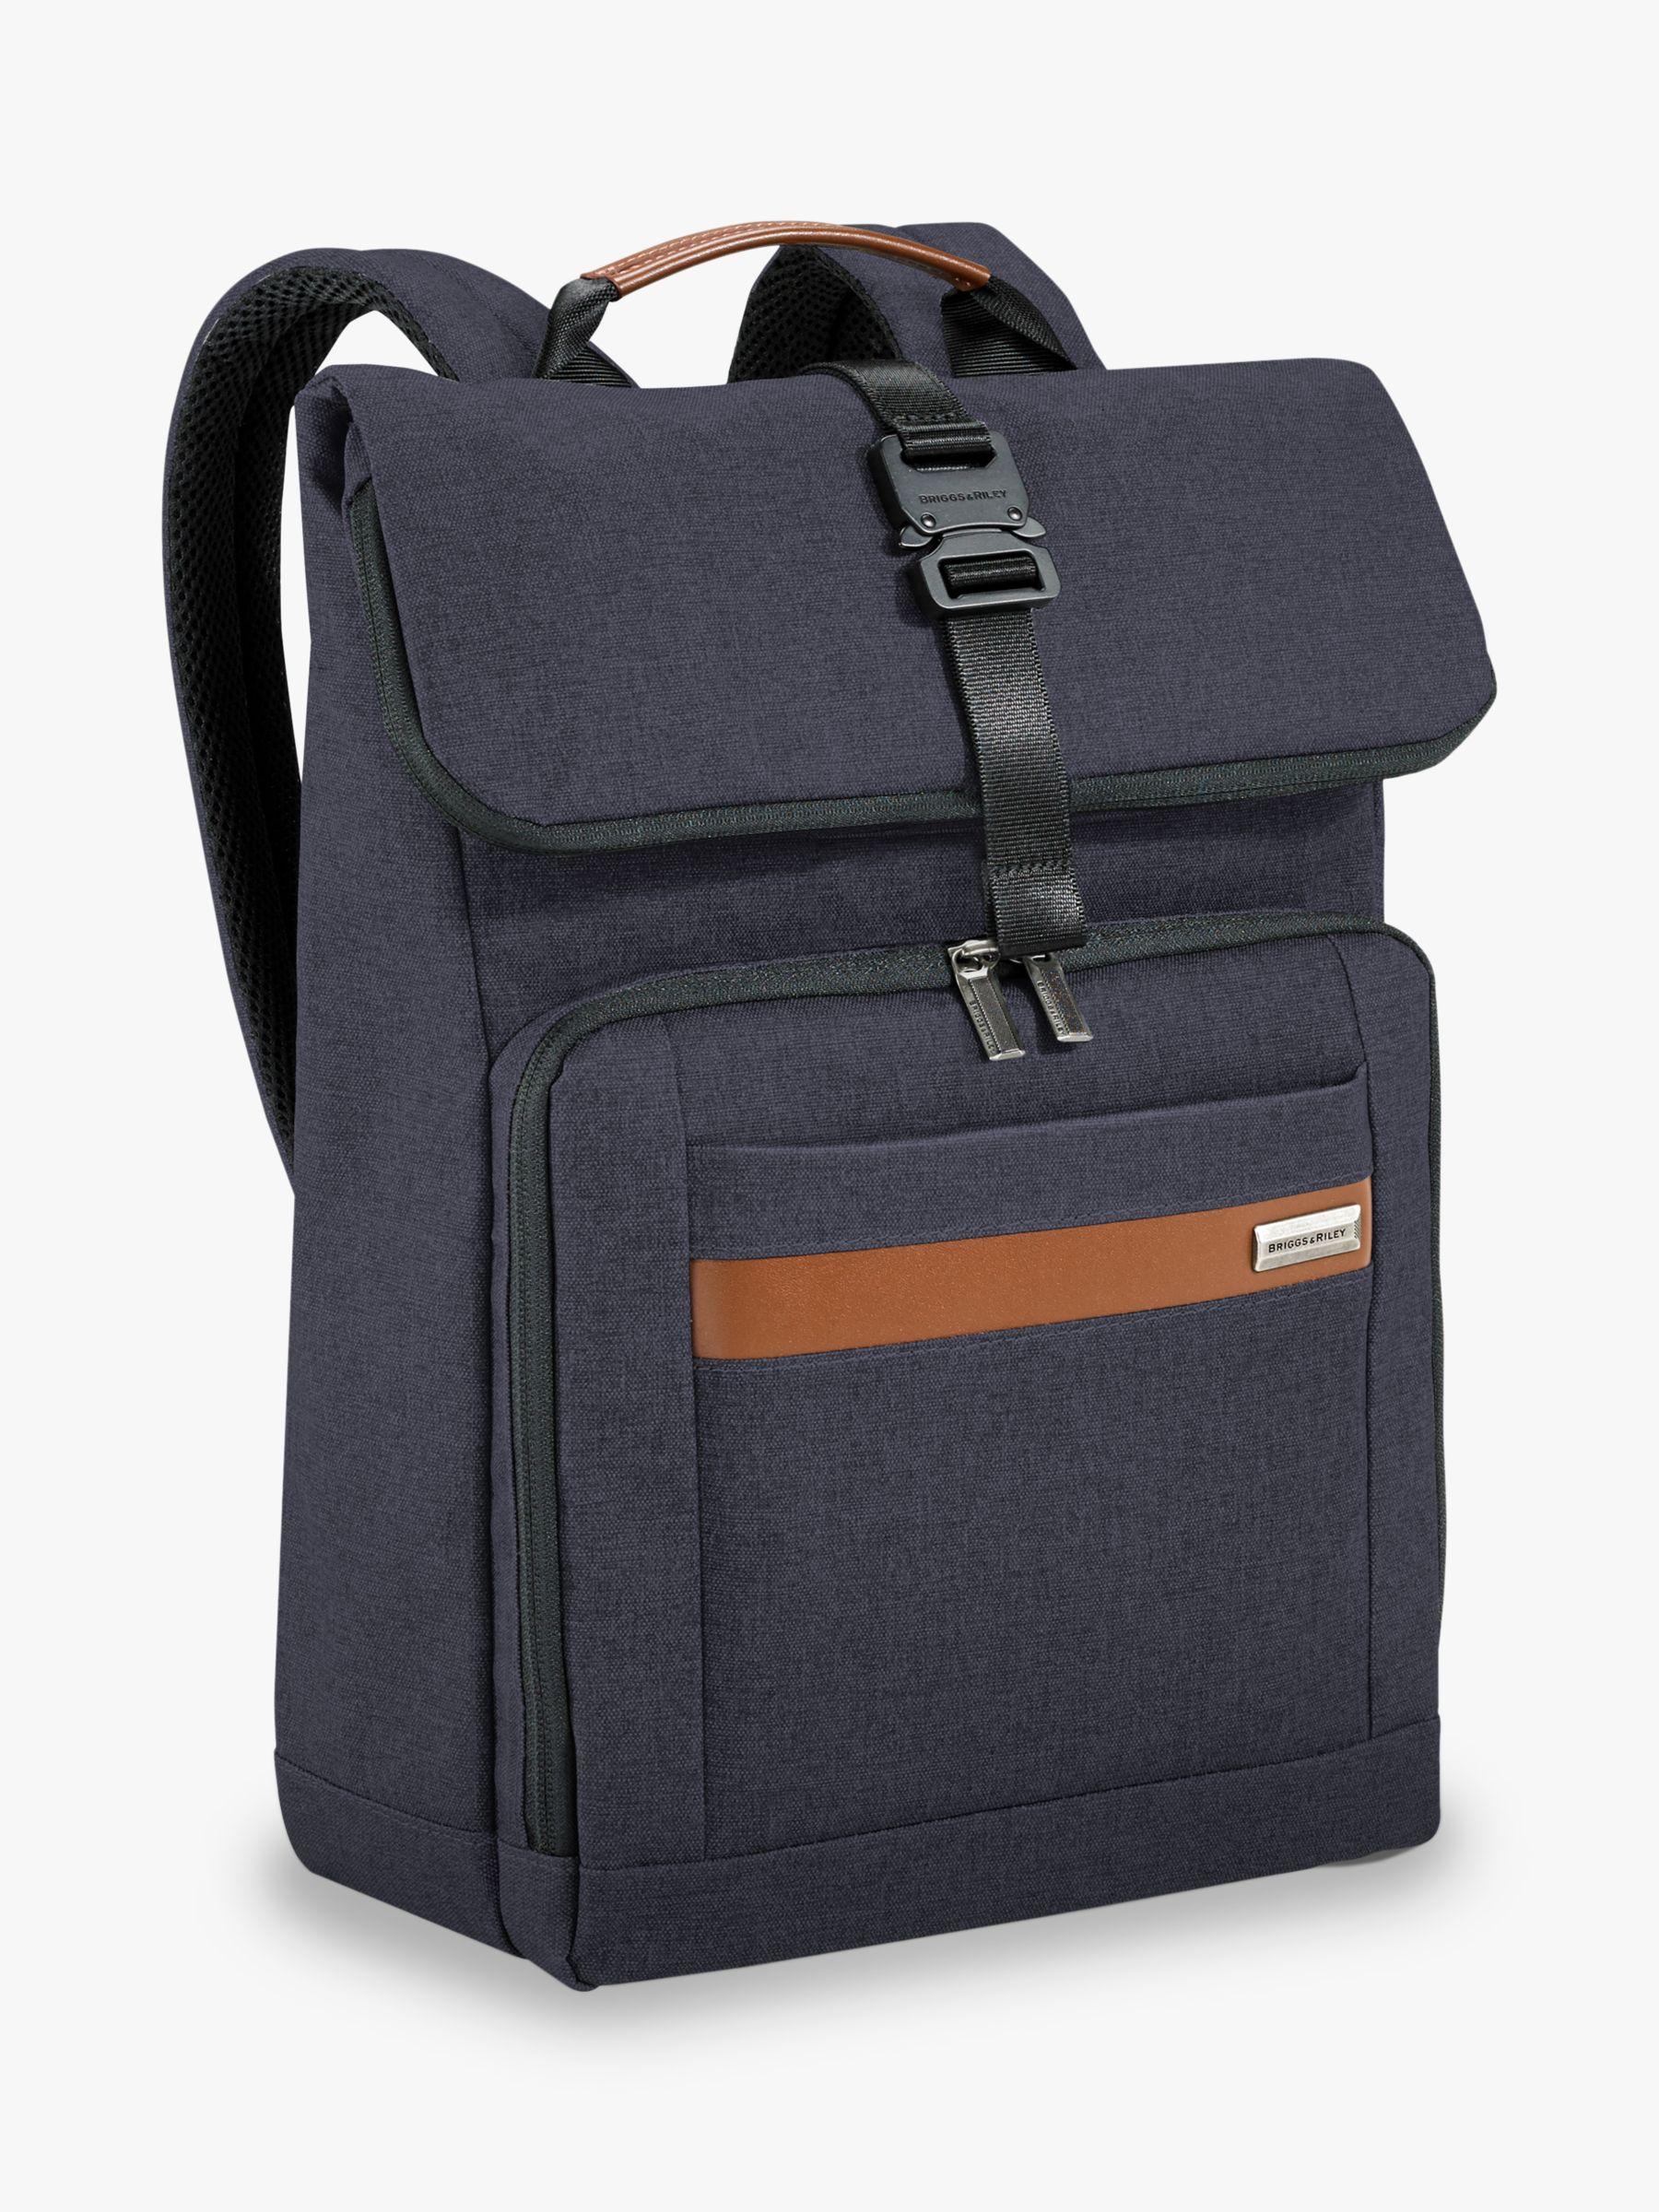 Briggs & Riley Briggs & Riley Kinzie Street 2.0 Medium Foldover Backpack